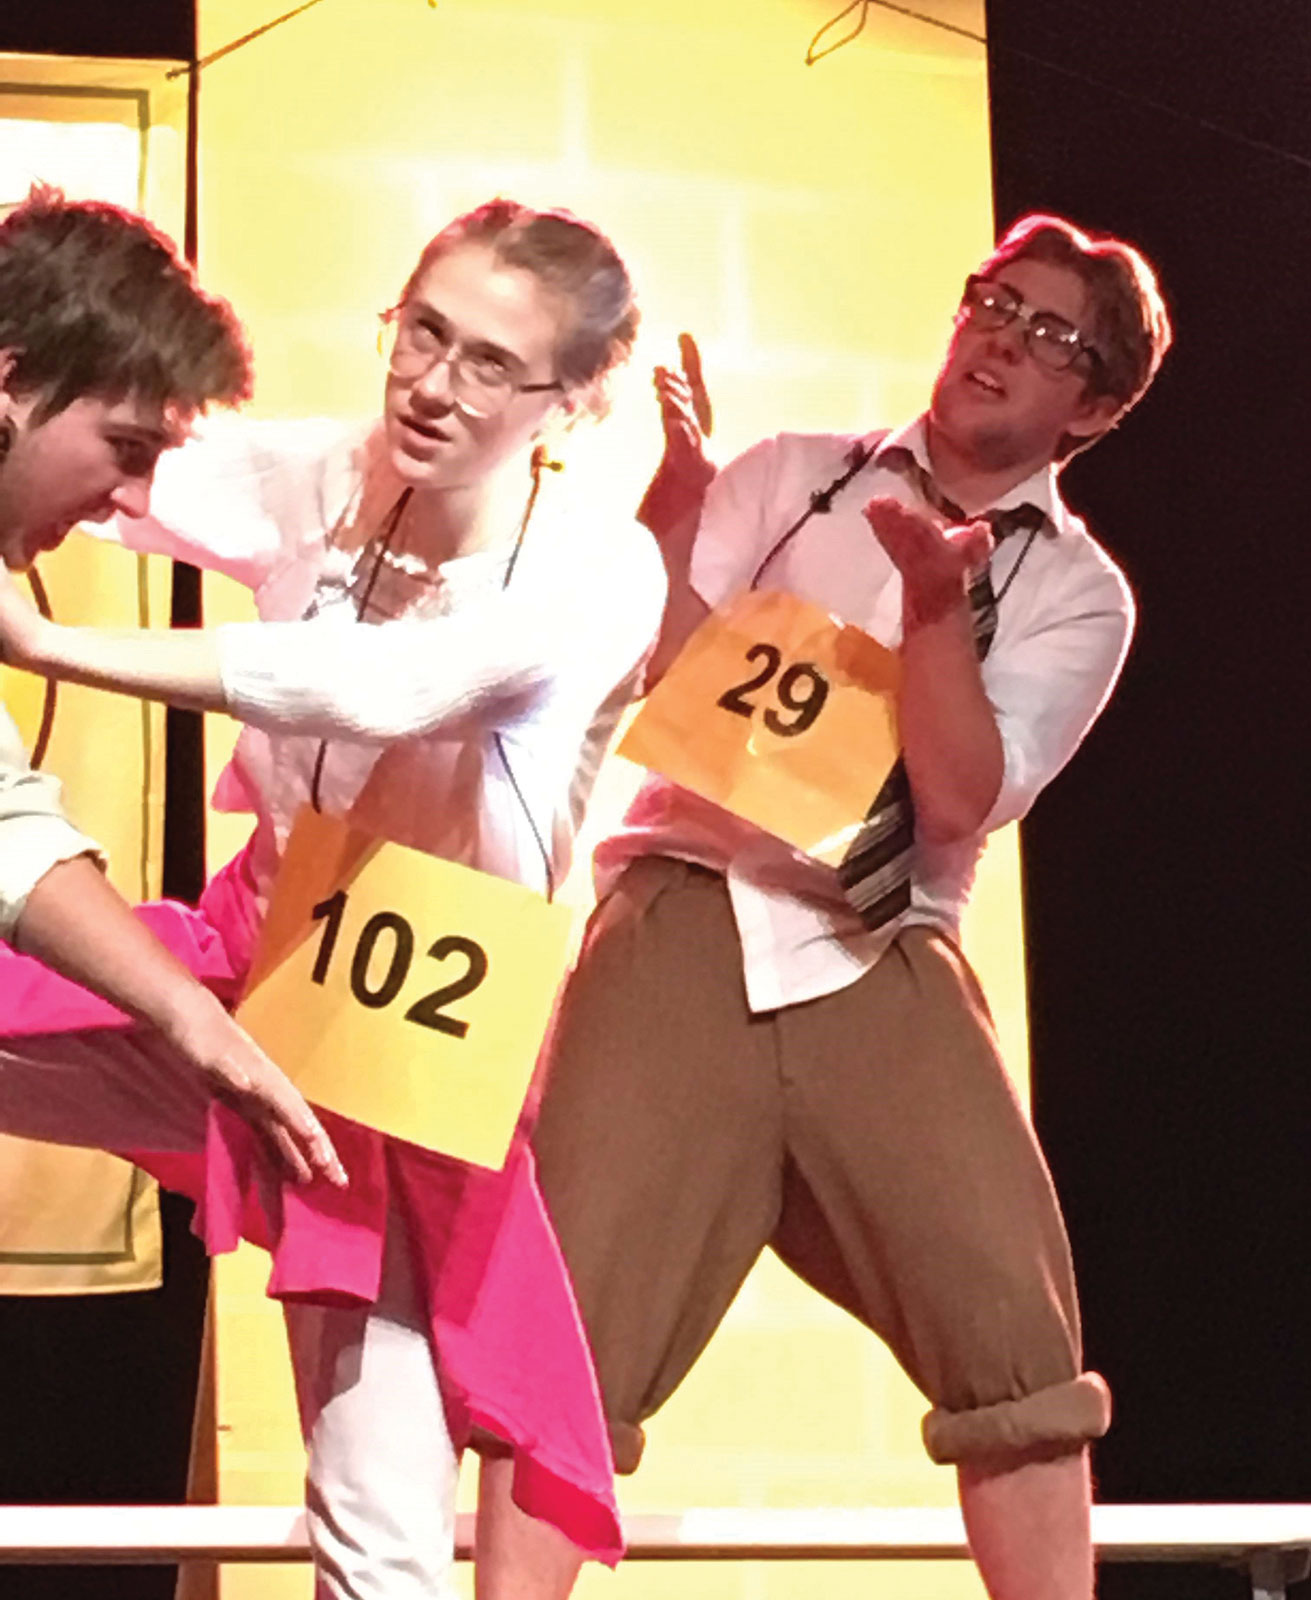 Senior Sebastian Boch as Vice Principal Panch, freshman Maddi Ruttenberg as Olive Ostrovsky, and senior Bowen Gray as William Barfee